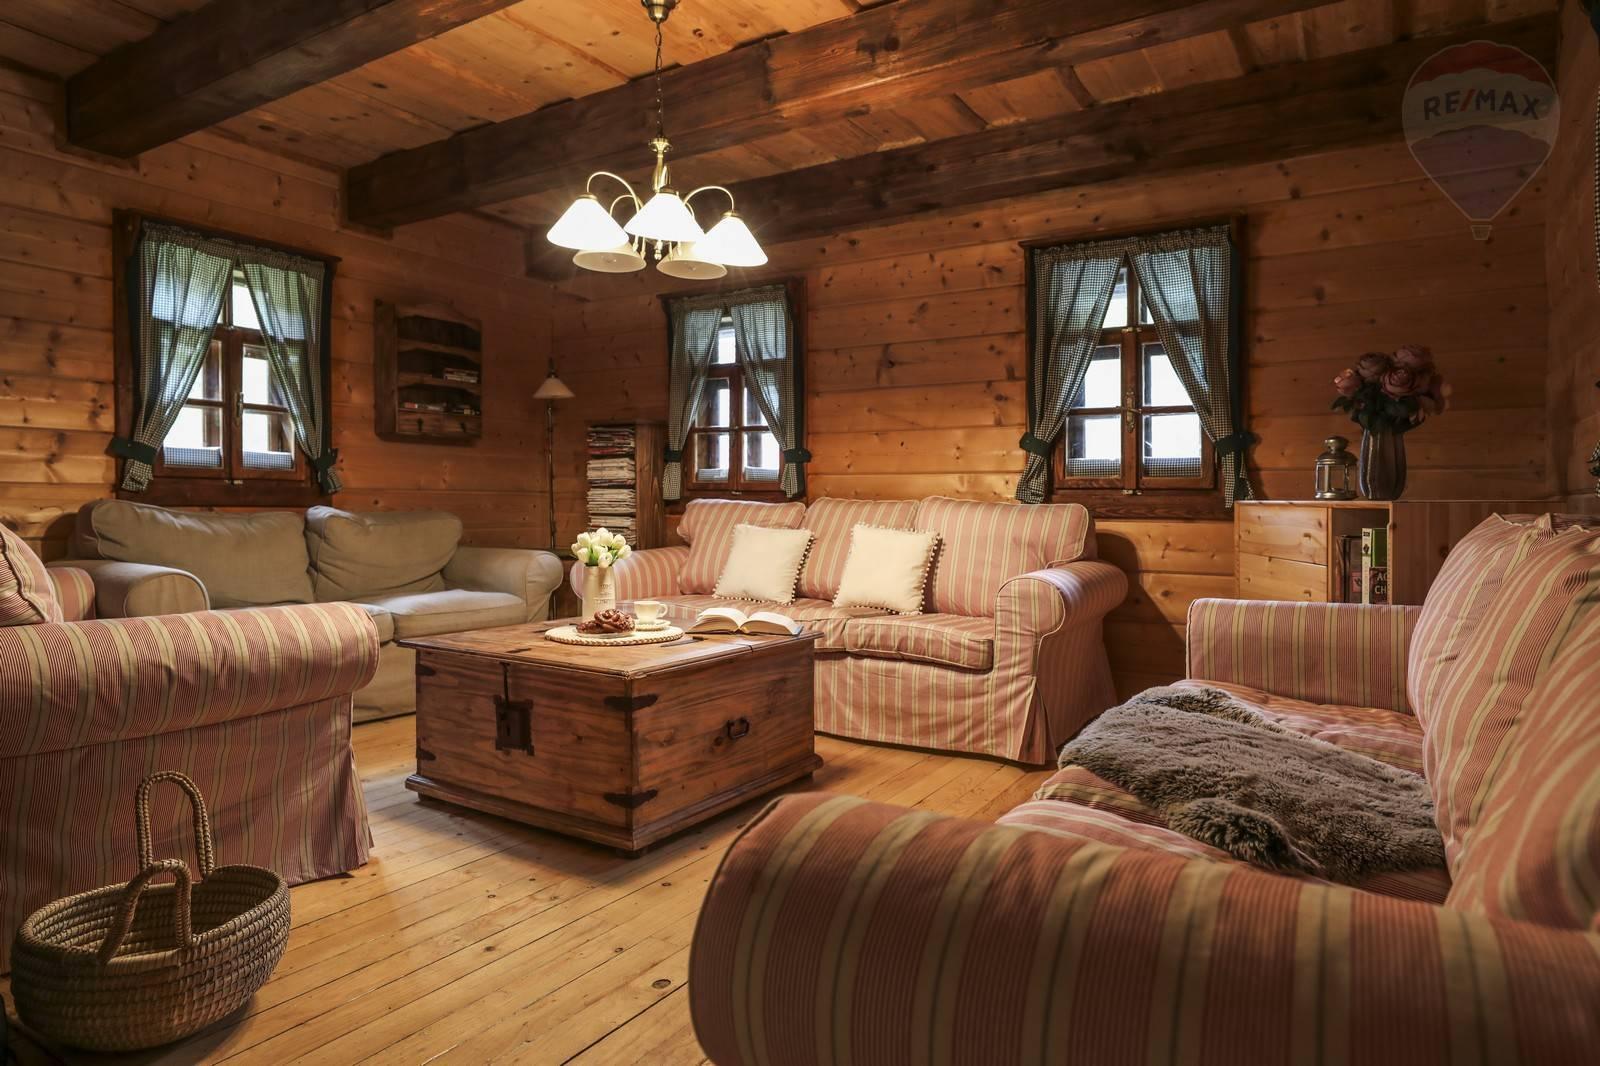 7-izbový drevodom Špania Dolina